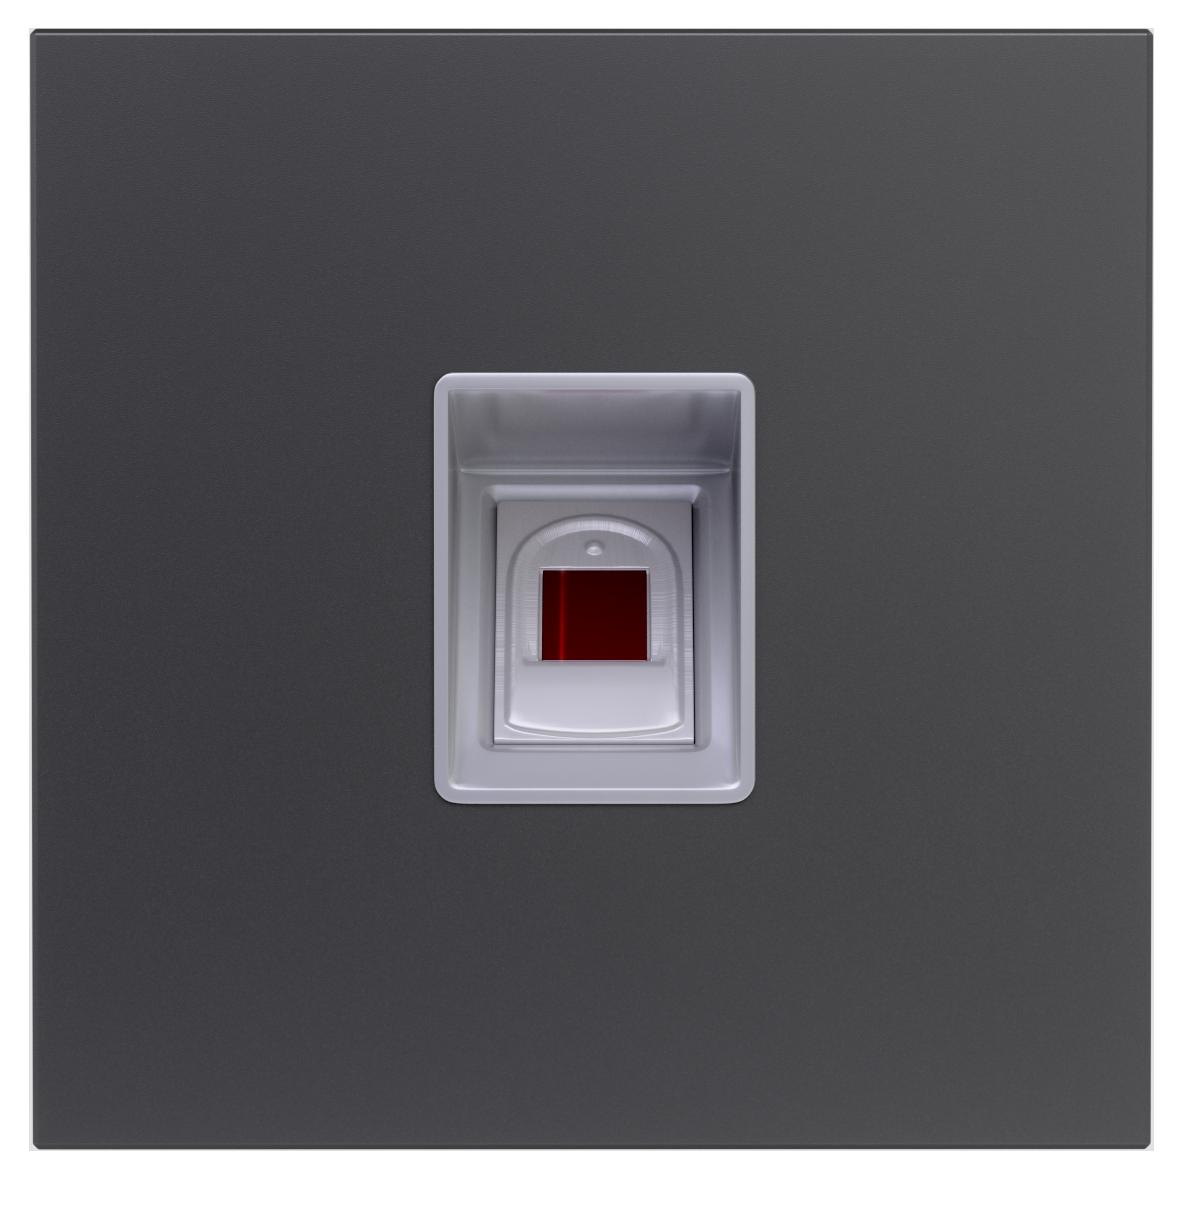 Modul Fingerprint - Hybrid Türsprechanlage Türklingel Anthrazit